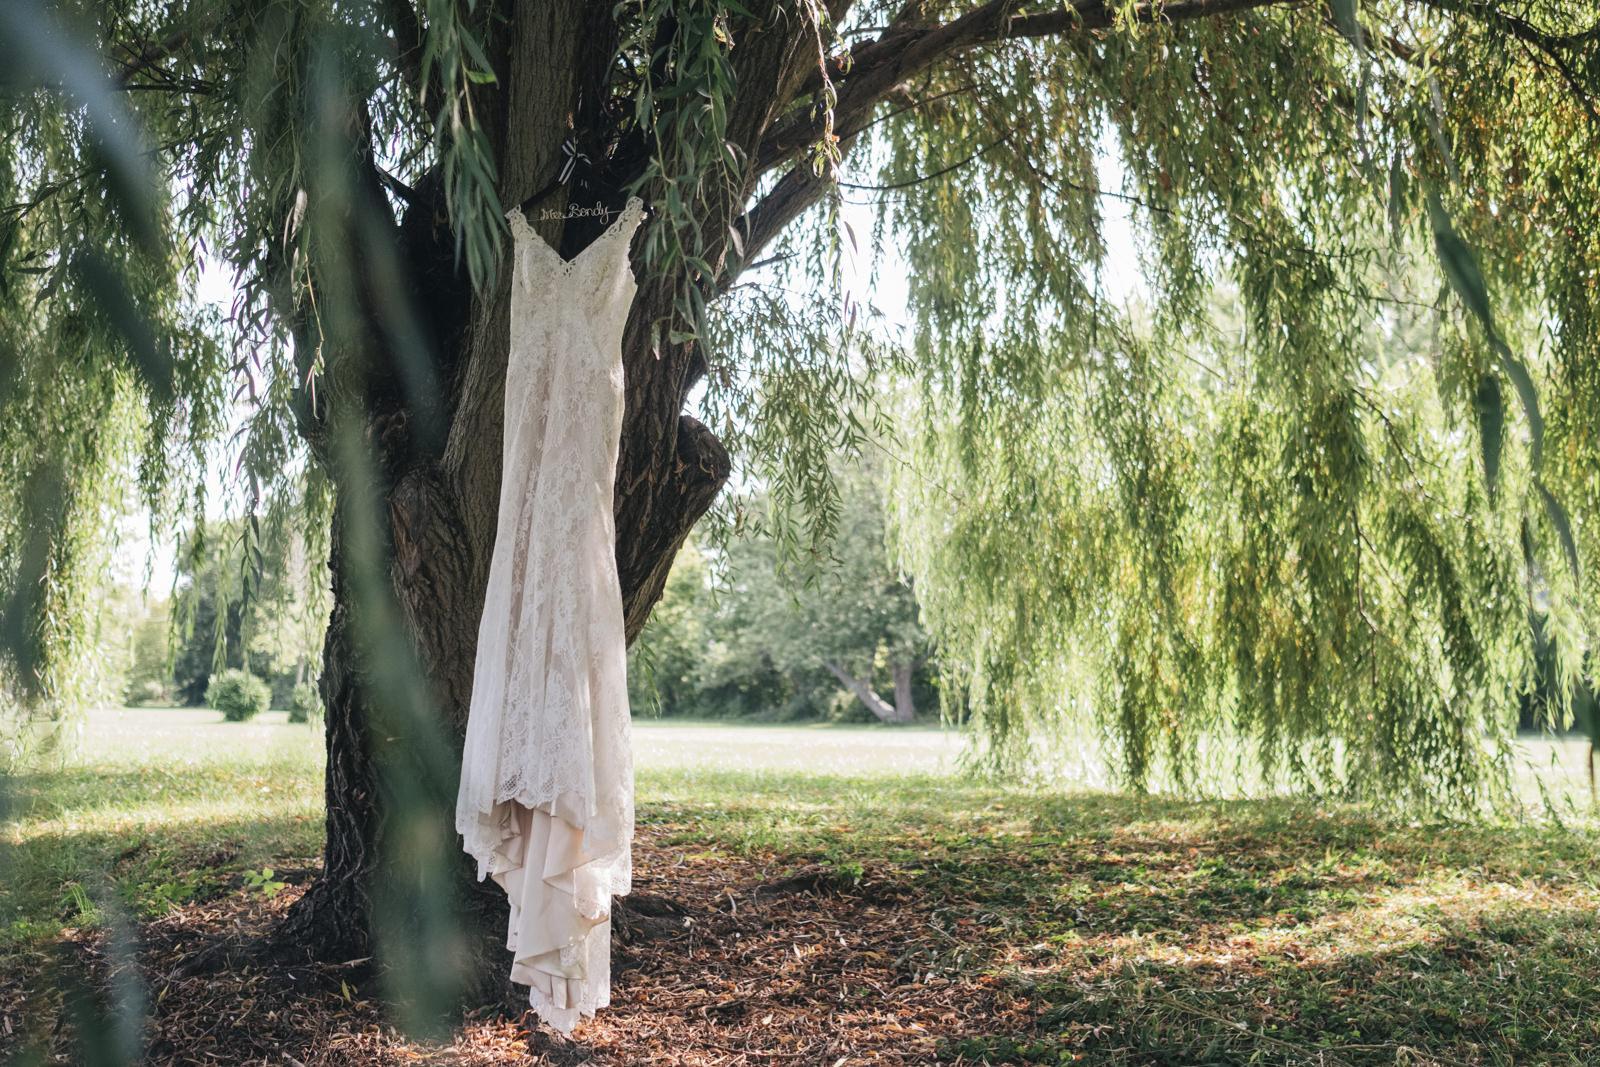 Nautical Pue Michigan wedding dress hanging in a willow tree.